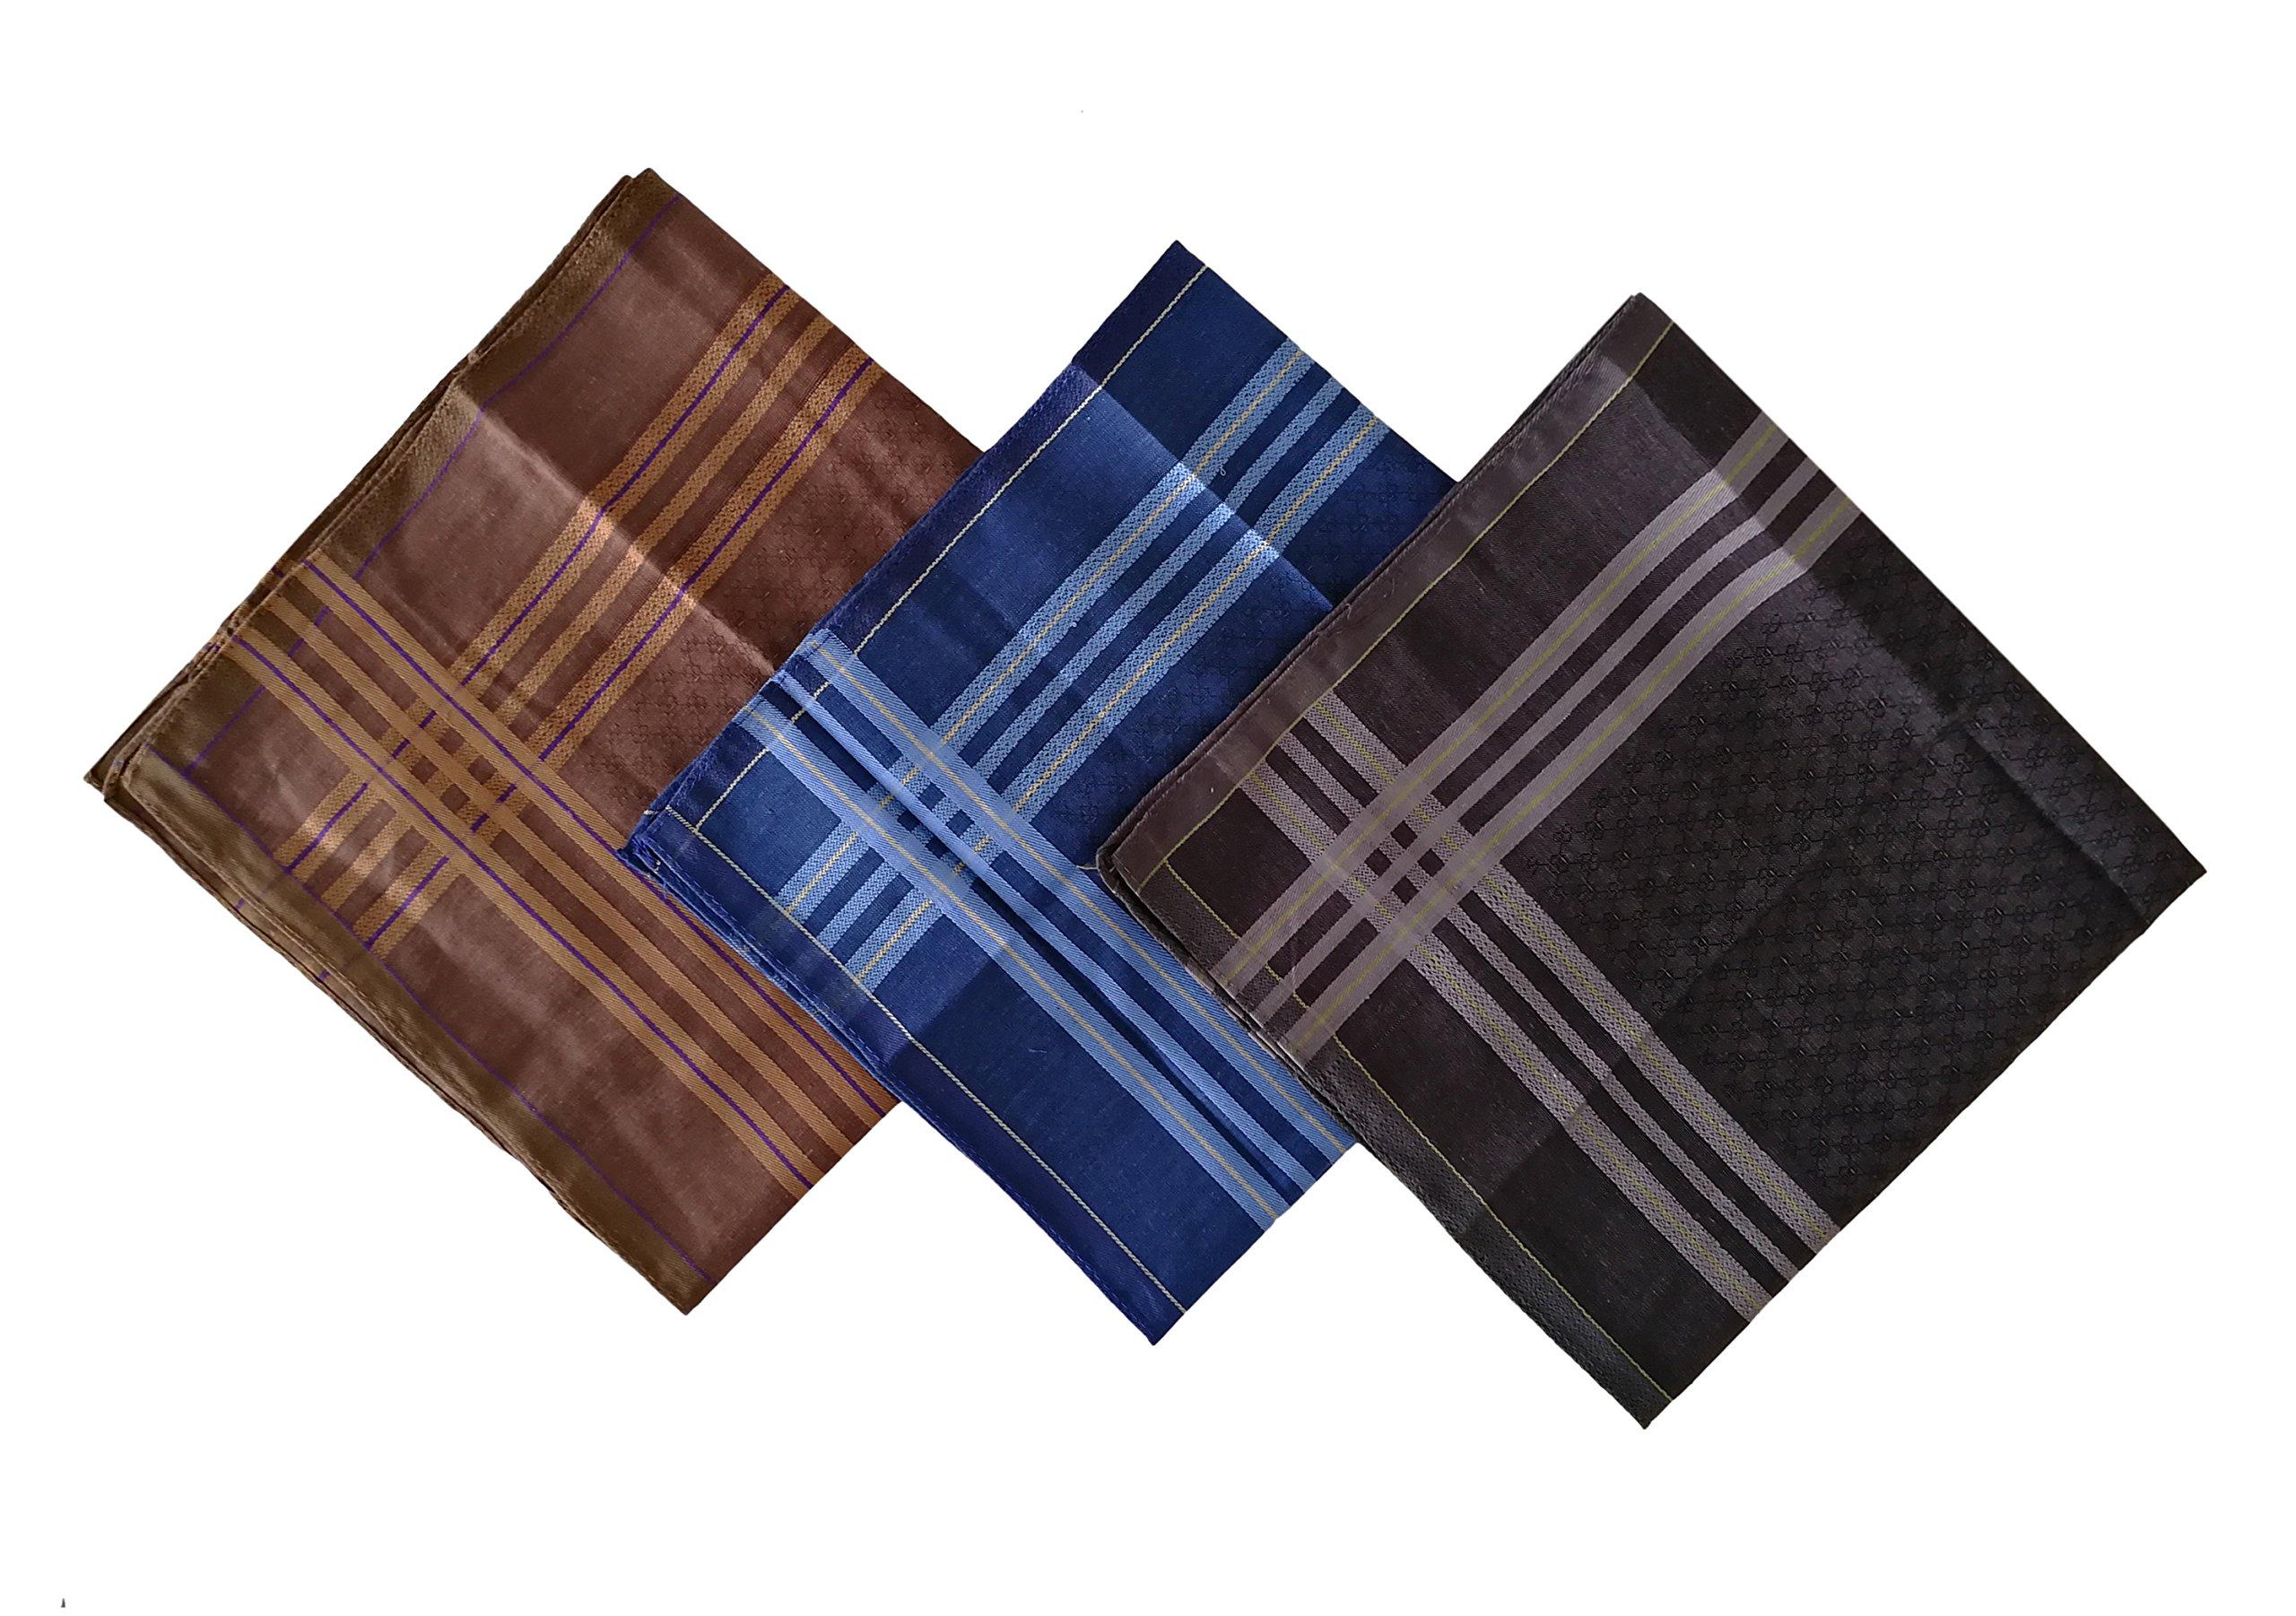 12PCS KINGREE Mens and Boys Gentleman Vintage Casual Hankie Cotton Handkerchiefs, 100% Cotton Men's Handkerchief (12PCS-Mix28)